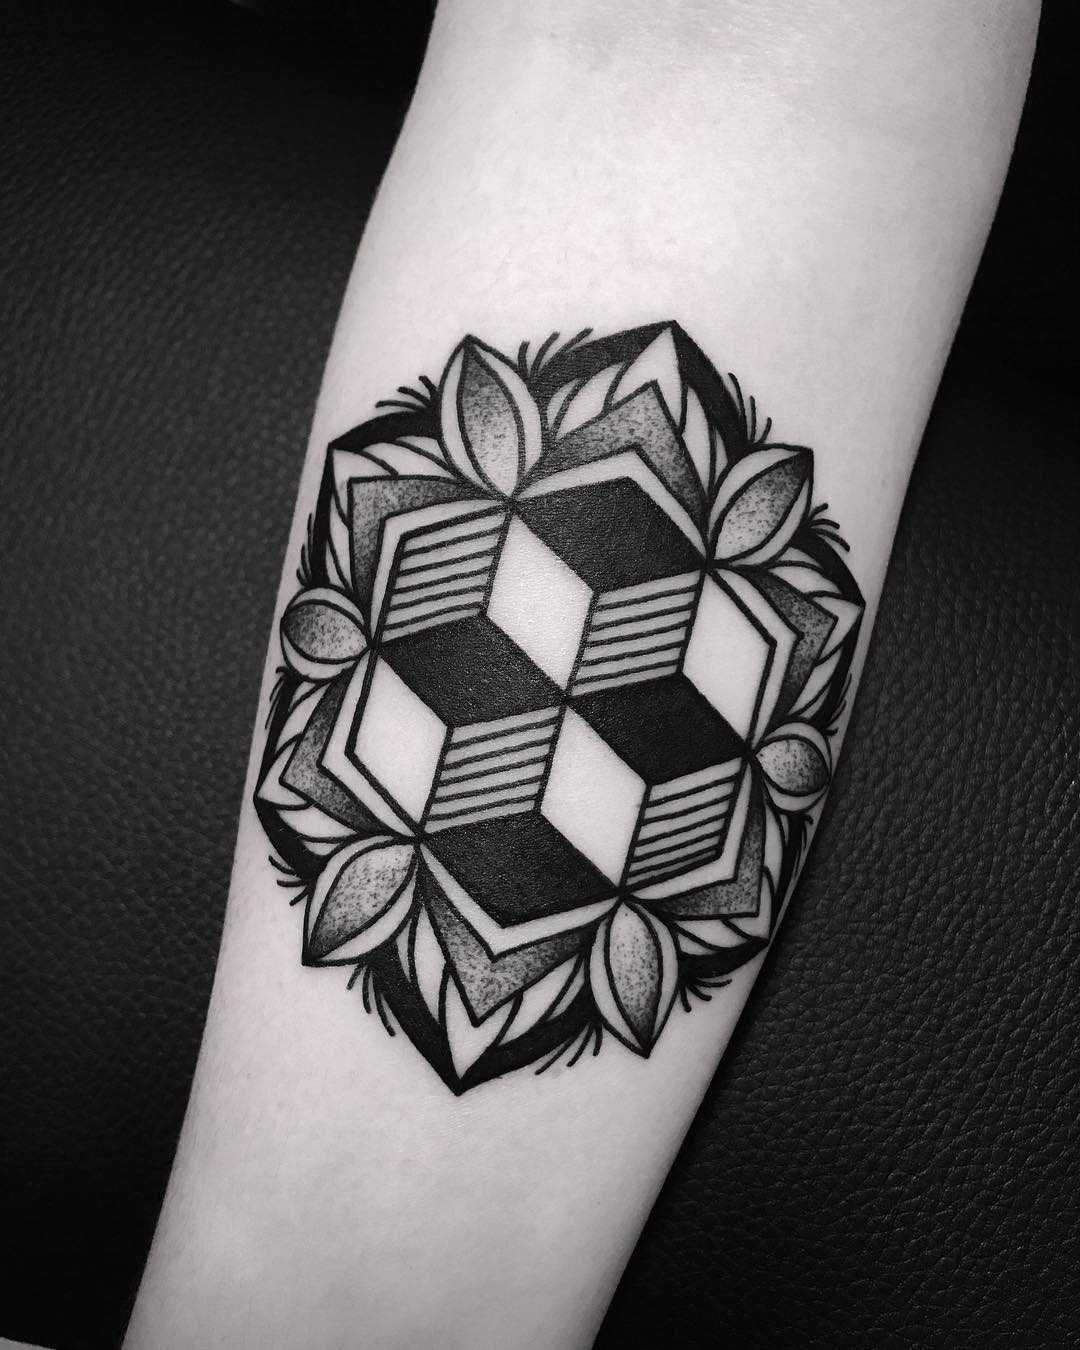 Cool geometry and mandala tattoo by Wagner Basei